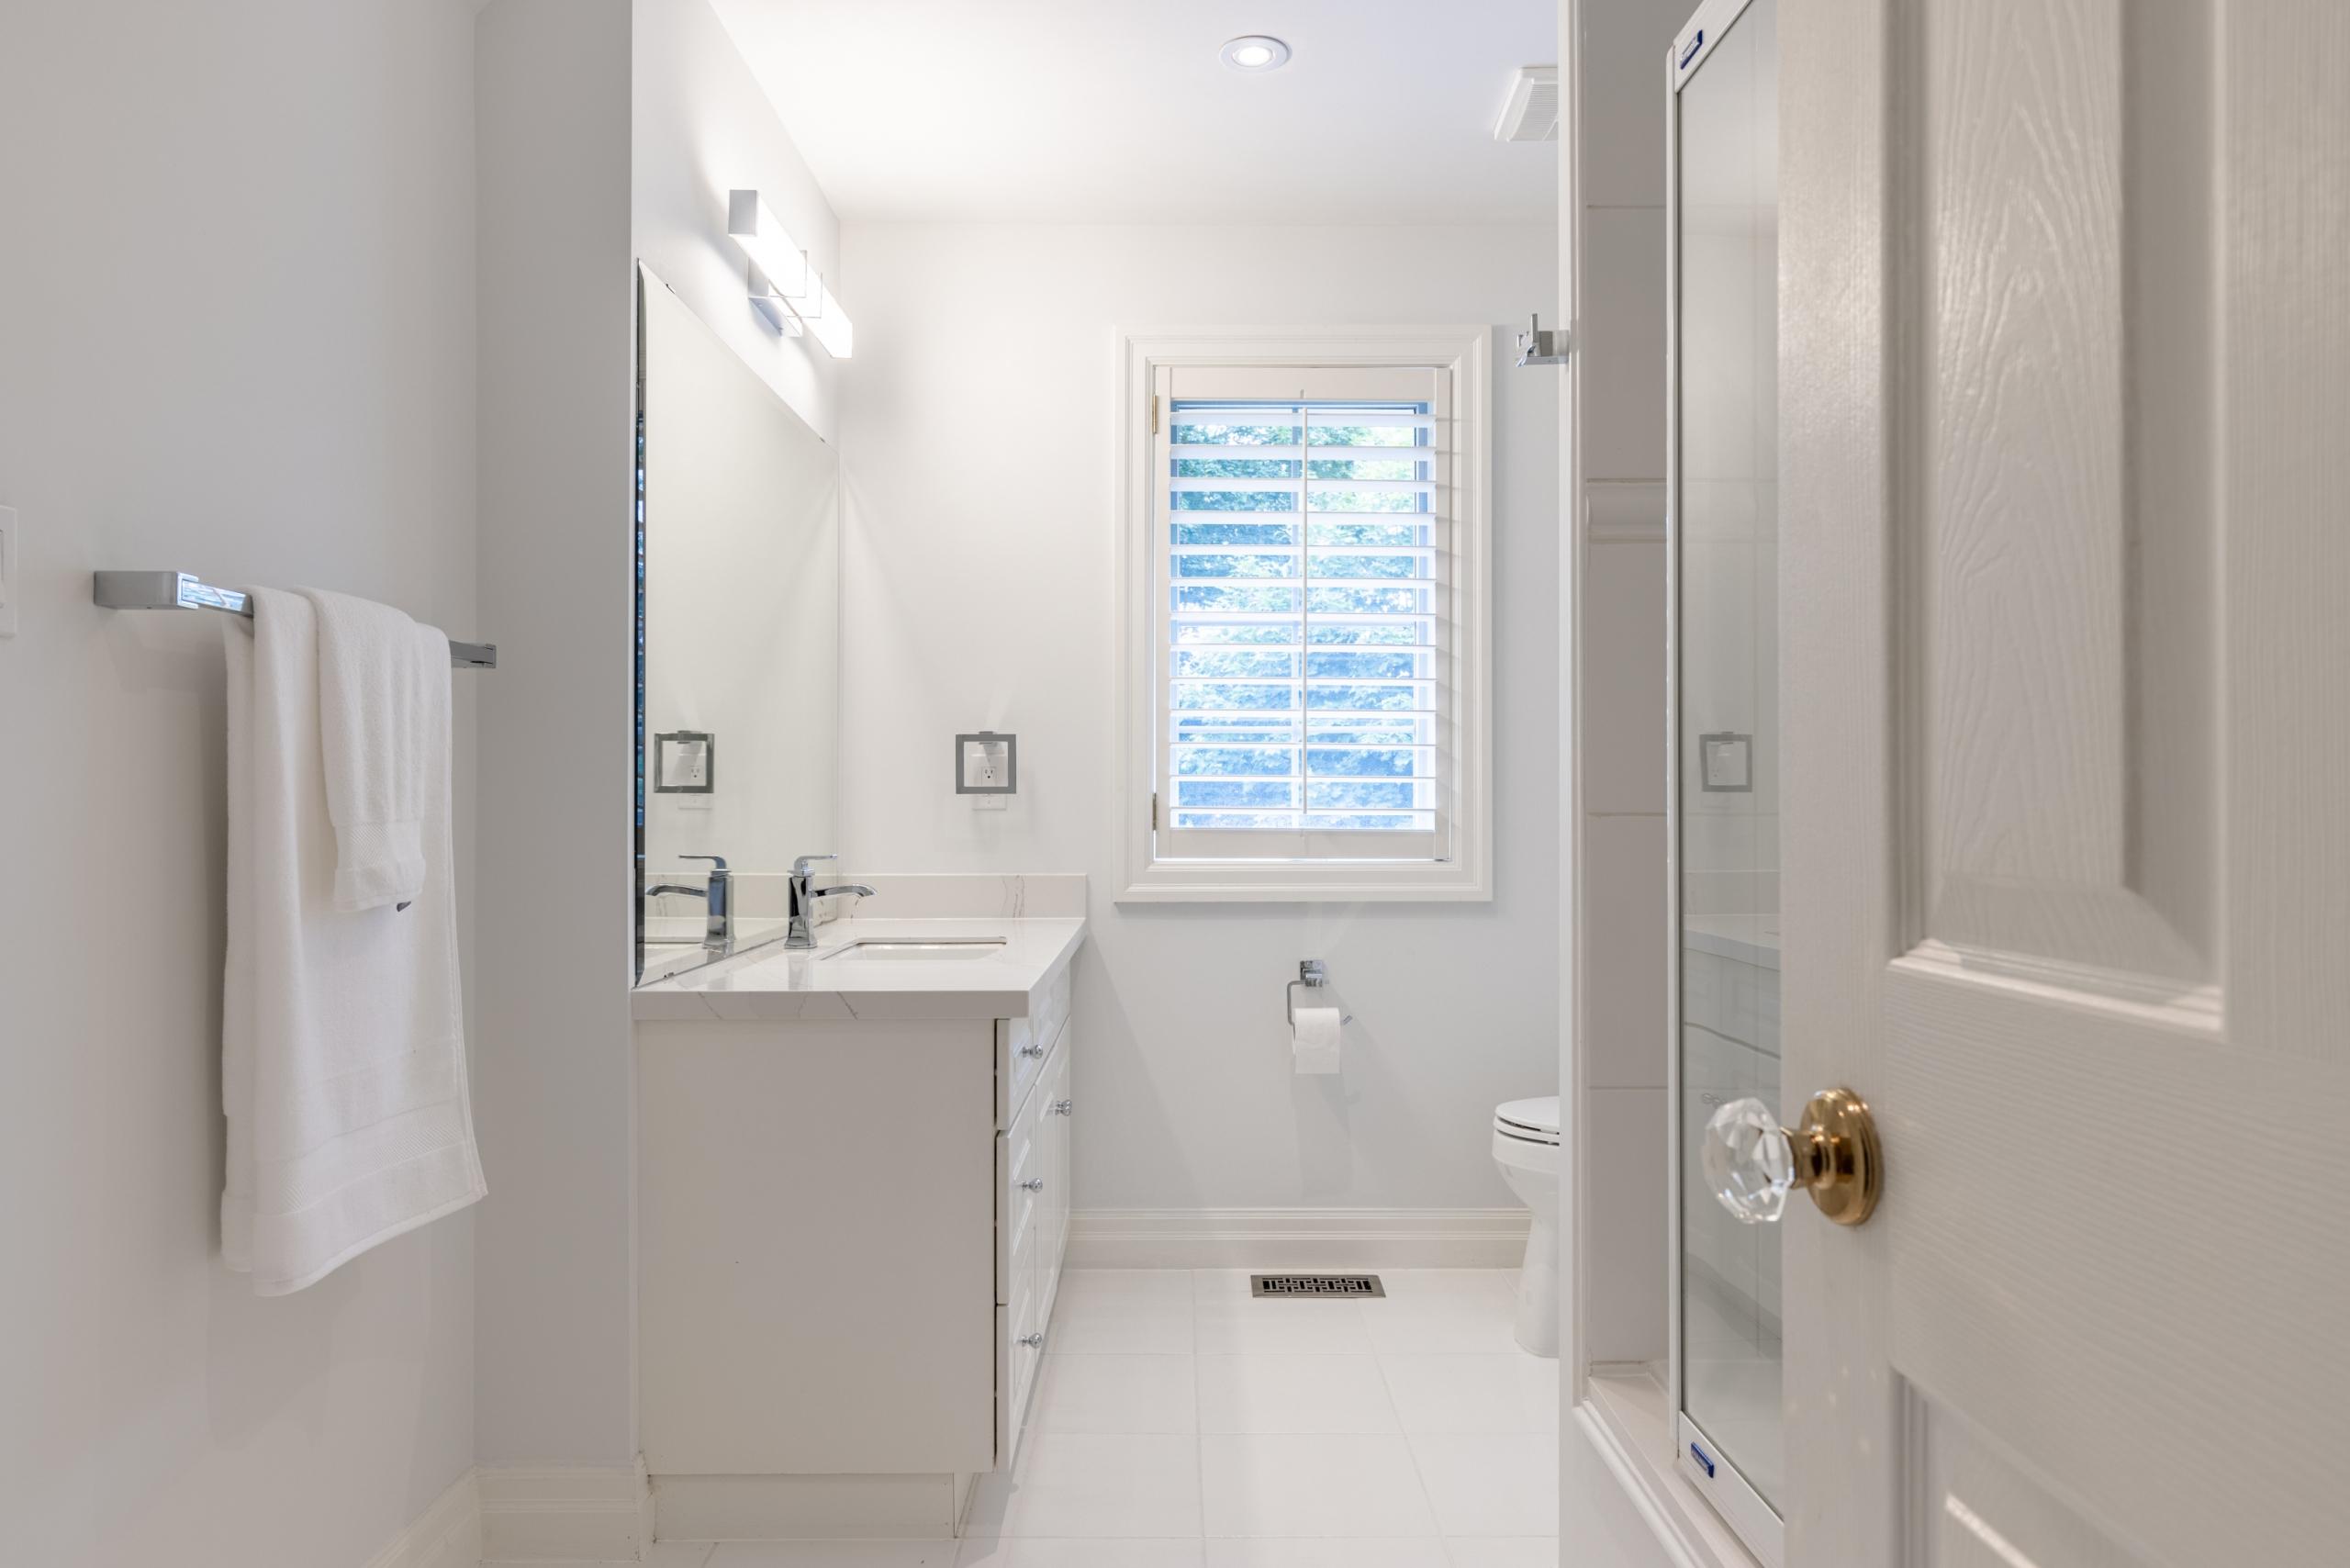 Bathroom featured at 956 Halsham Court, Mississauga at Alex Irish & Associates